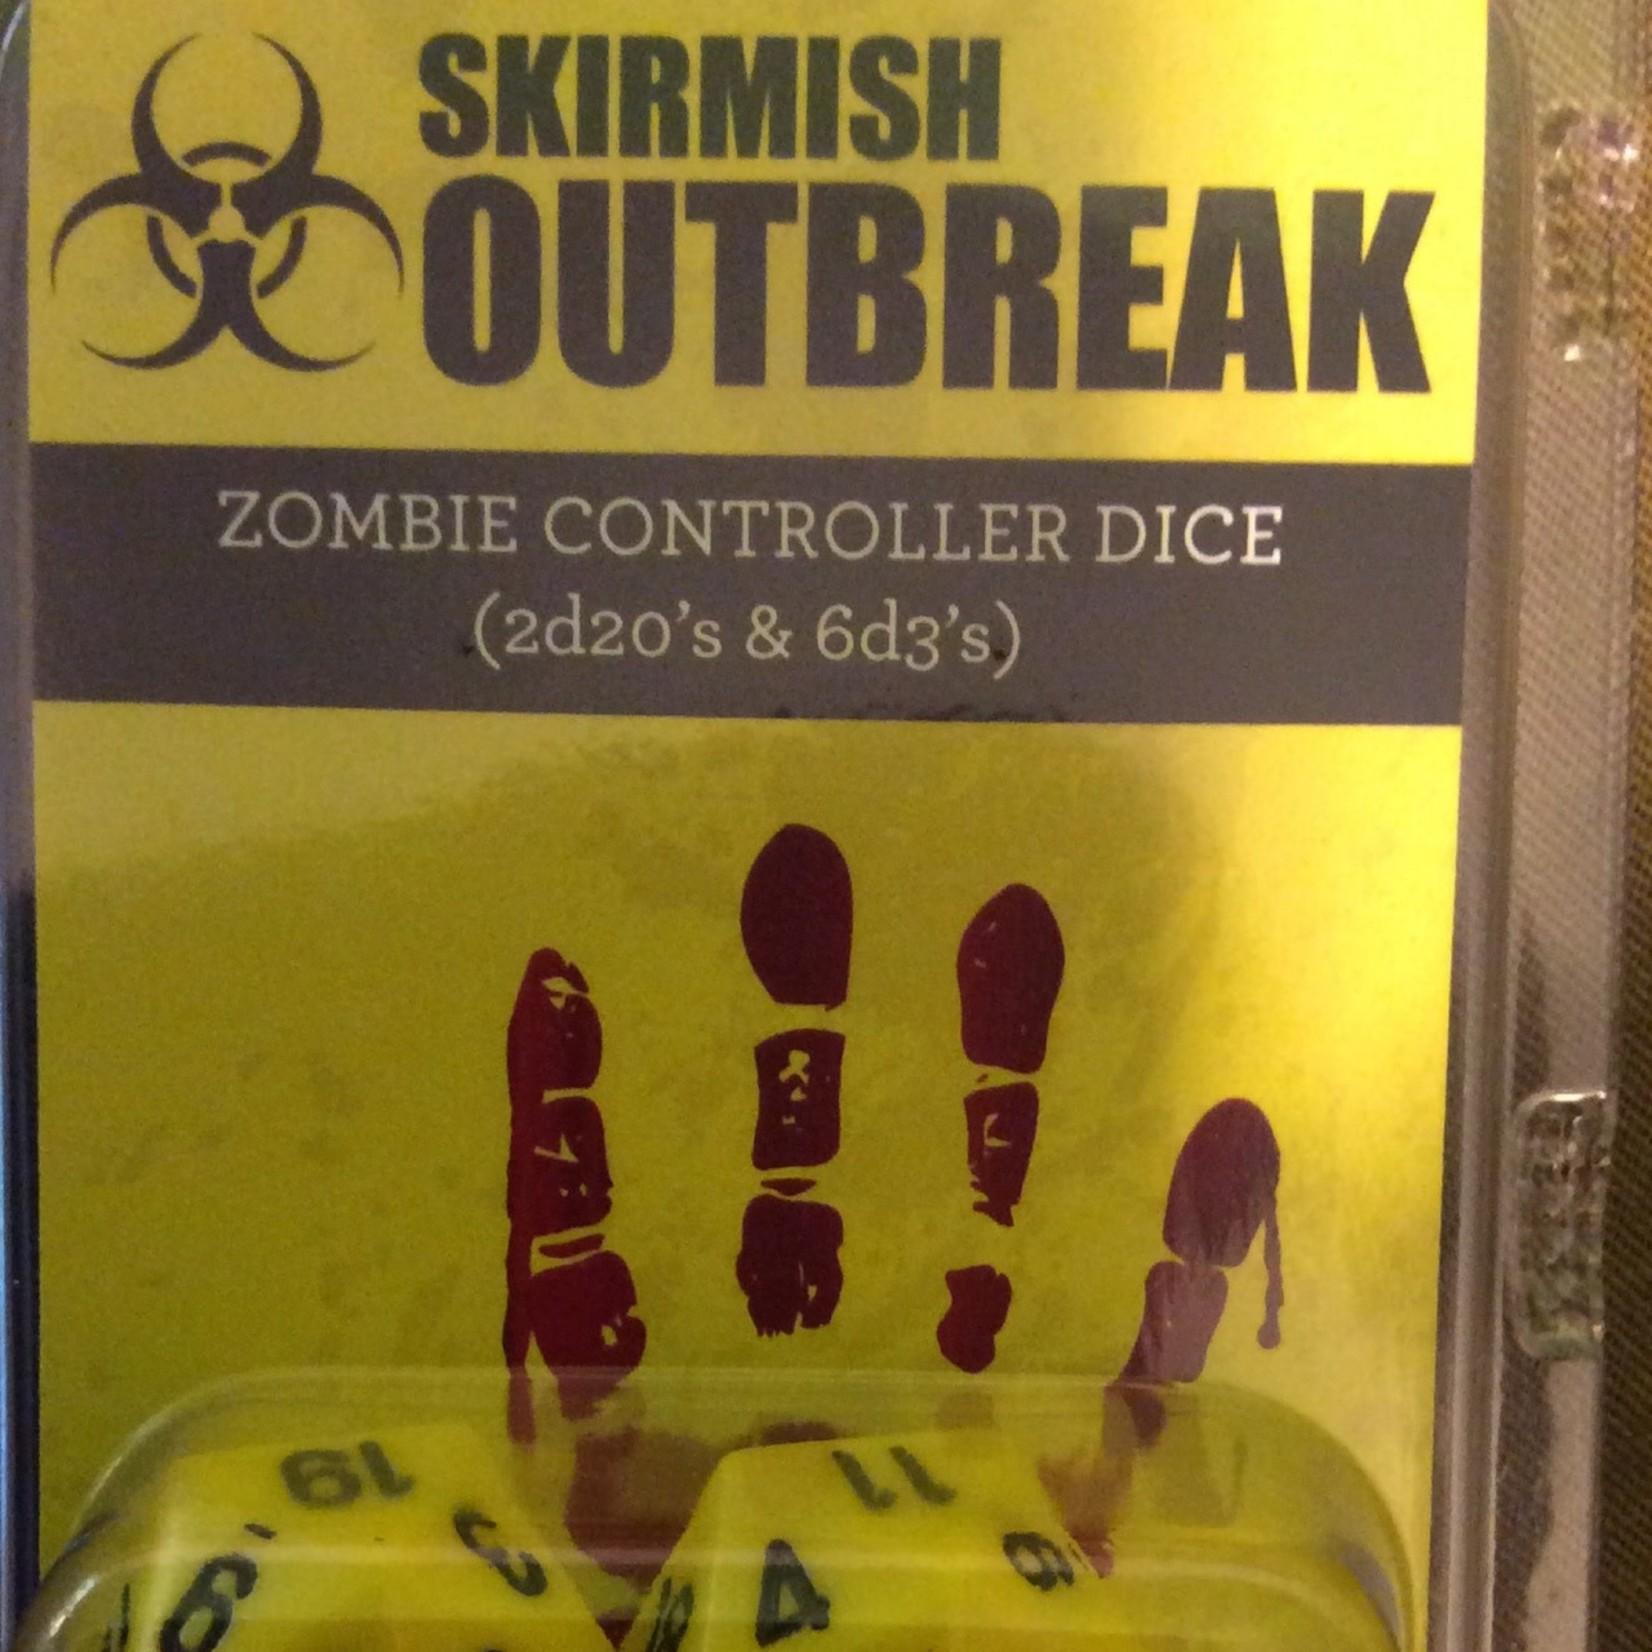 Zombie Controller Dice